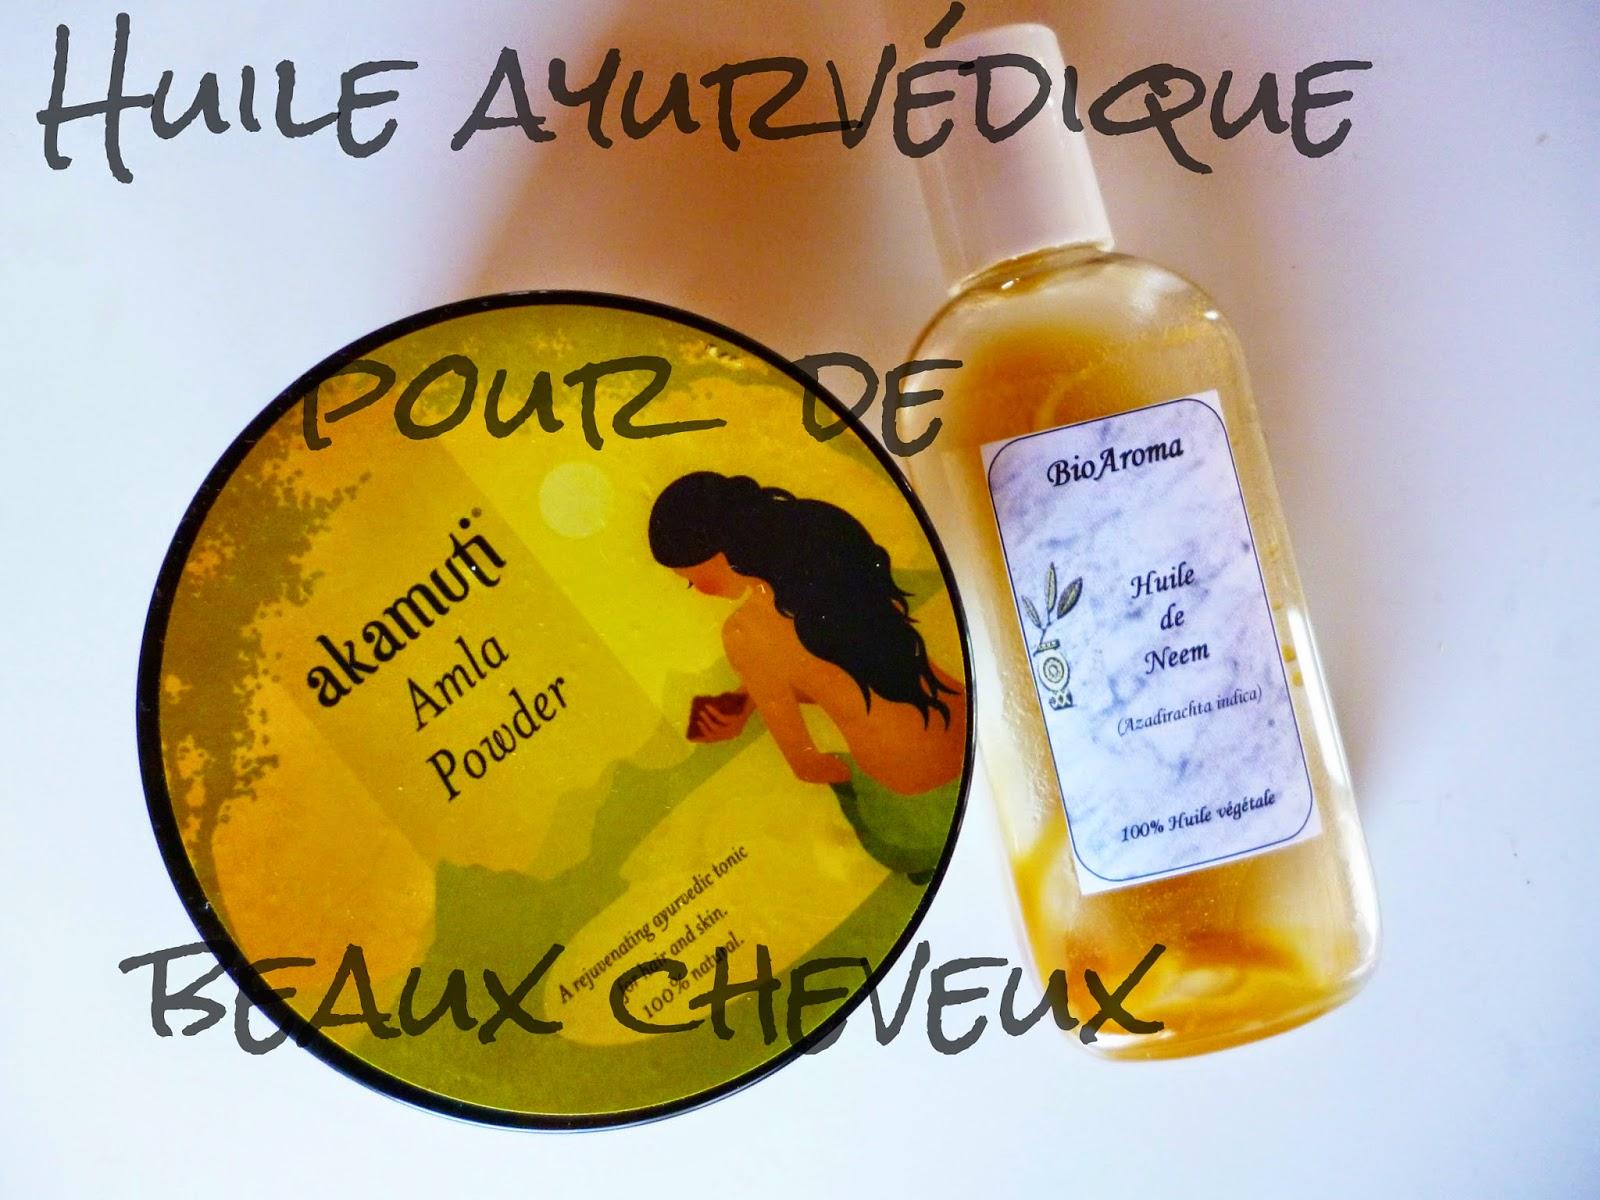 http://blossomingbioty.blogspot.com/2015/03/huile-ayurvedique-beaux-cheveux.html